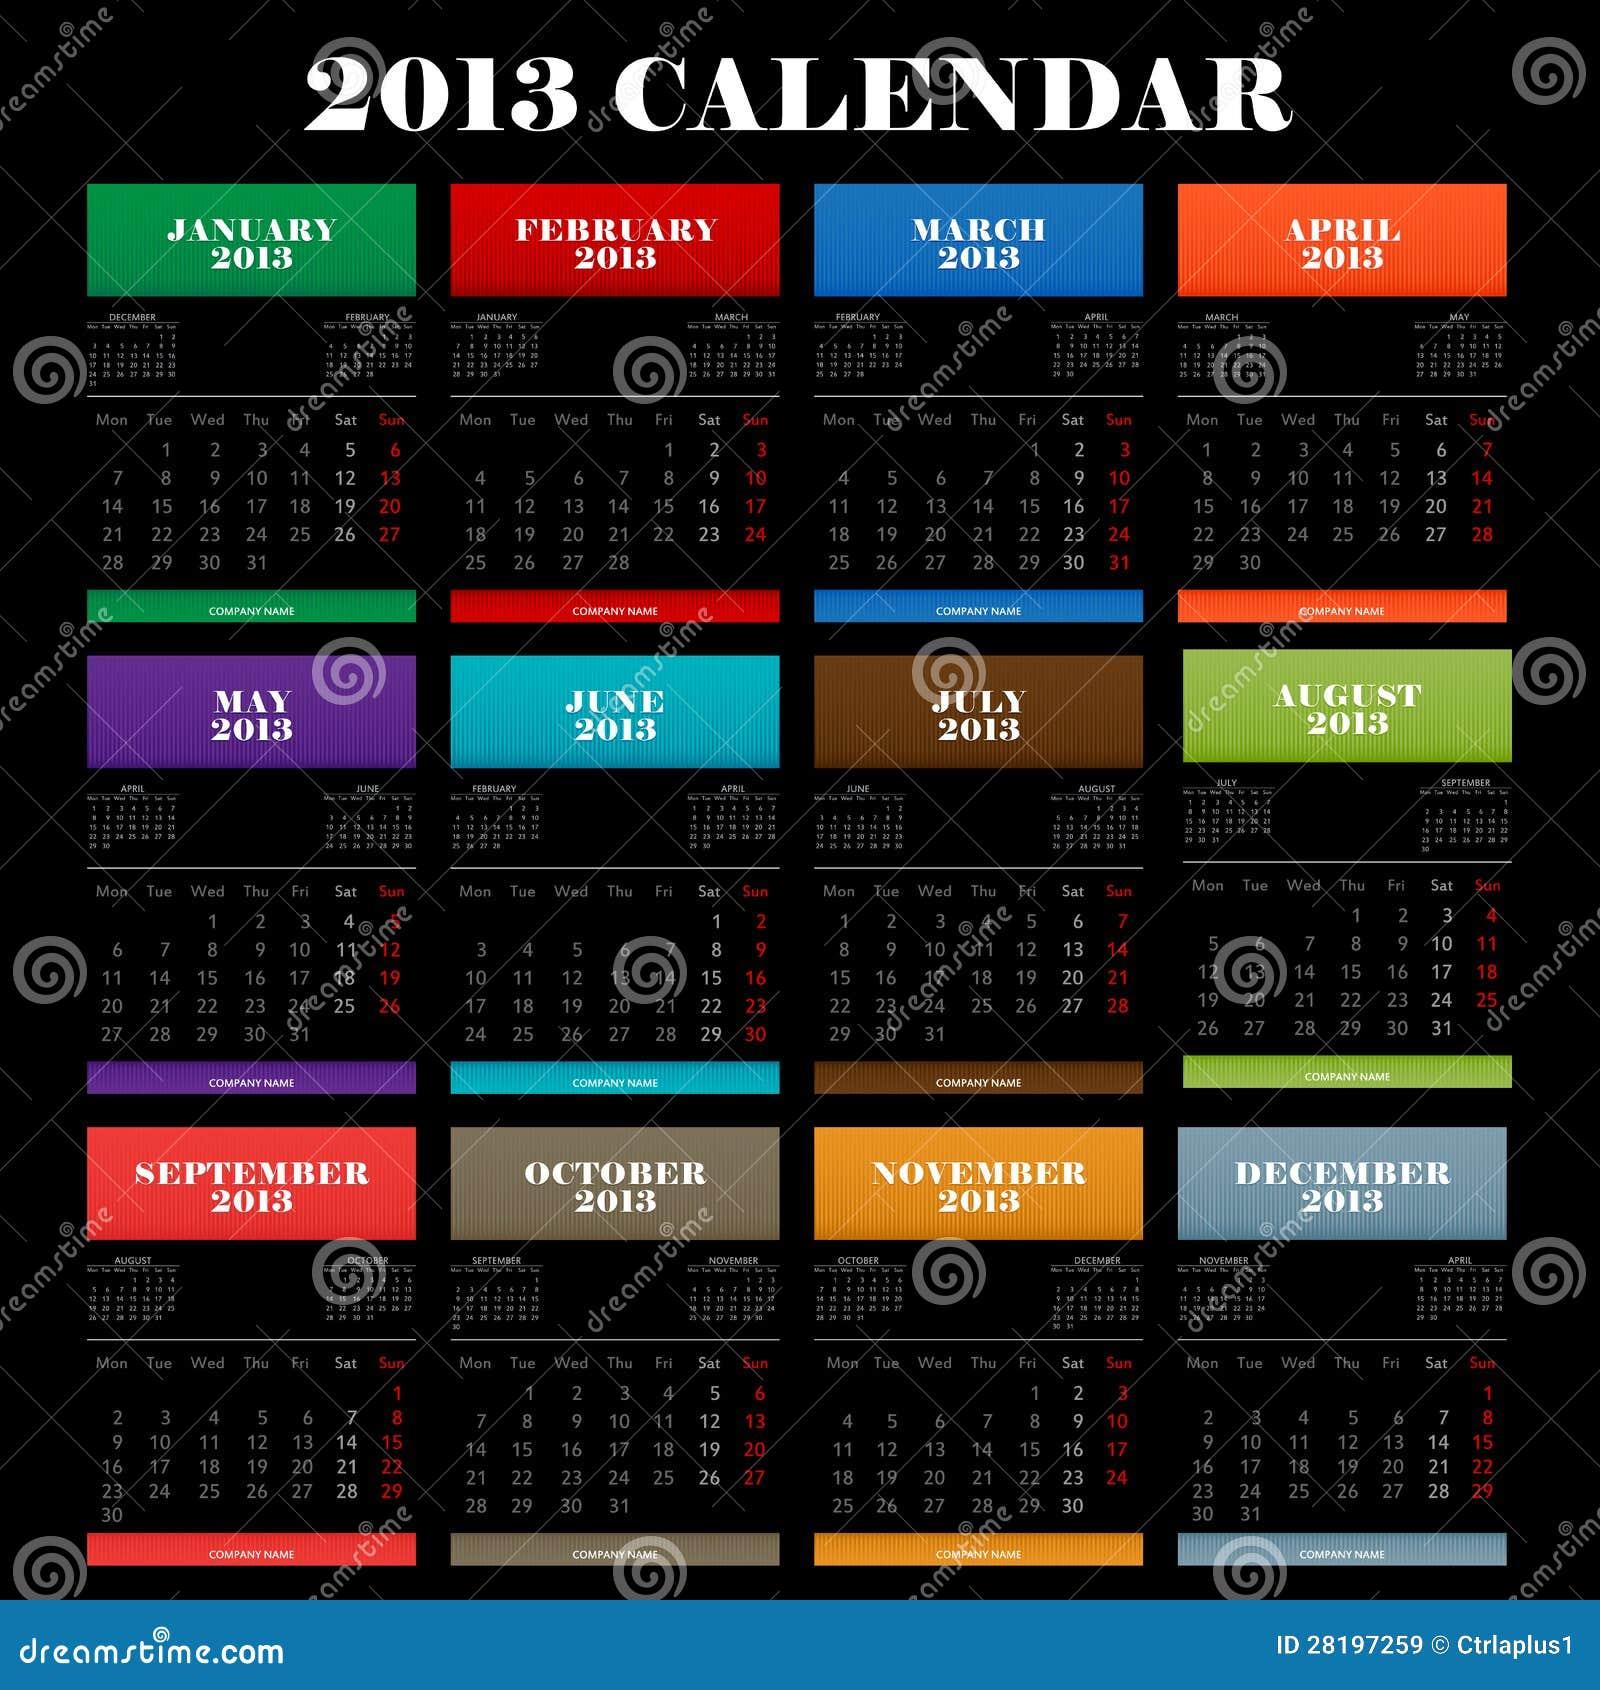 Full Color 2013 Year Calendar Stock Vector - Illustration ...